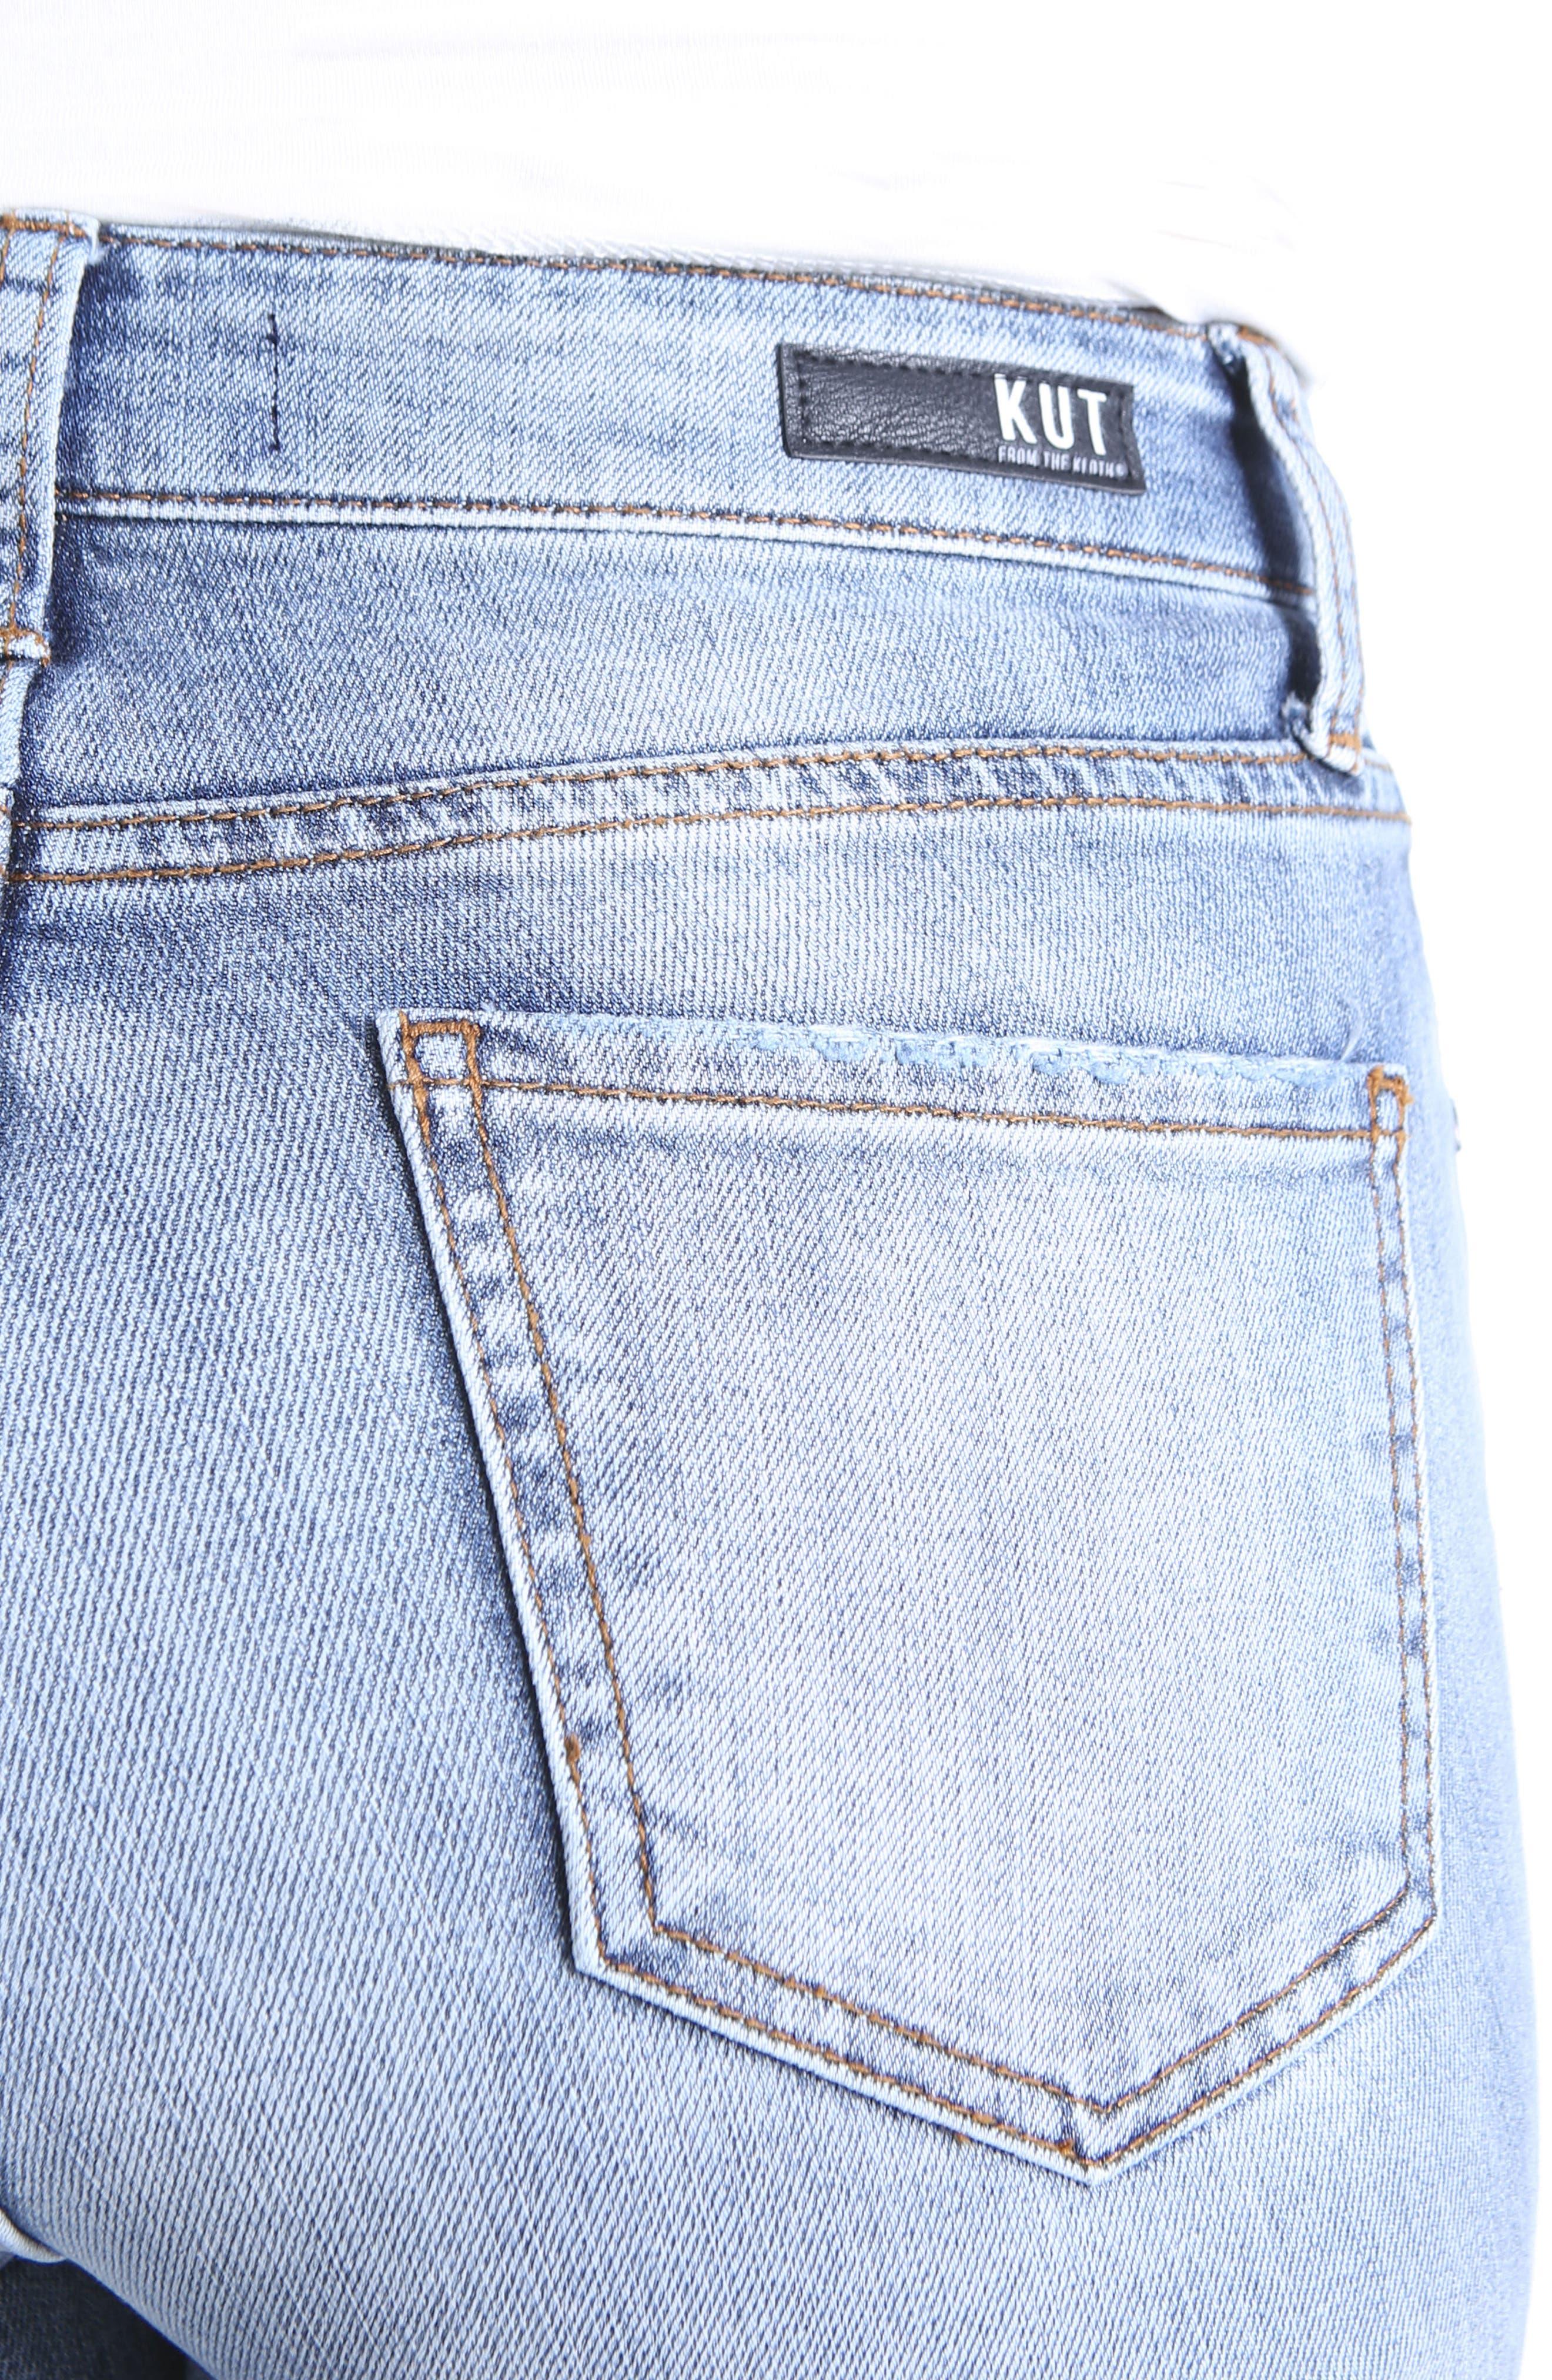 Reese Dark Flare Inset Straight Leg Ankle Jeans,                             Alternate thumbnail 4, color,                             400